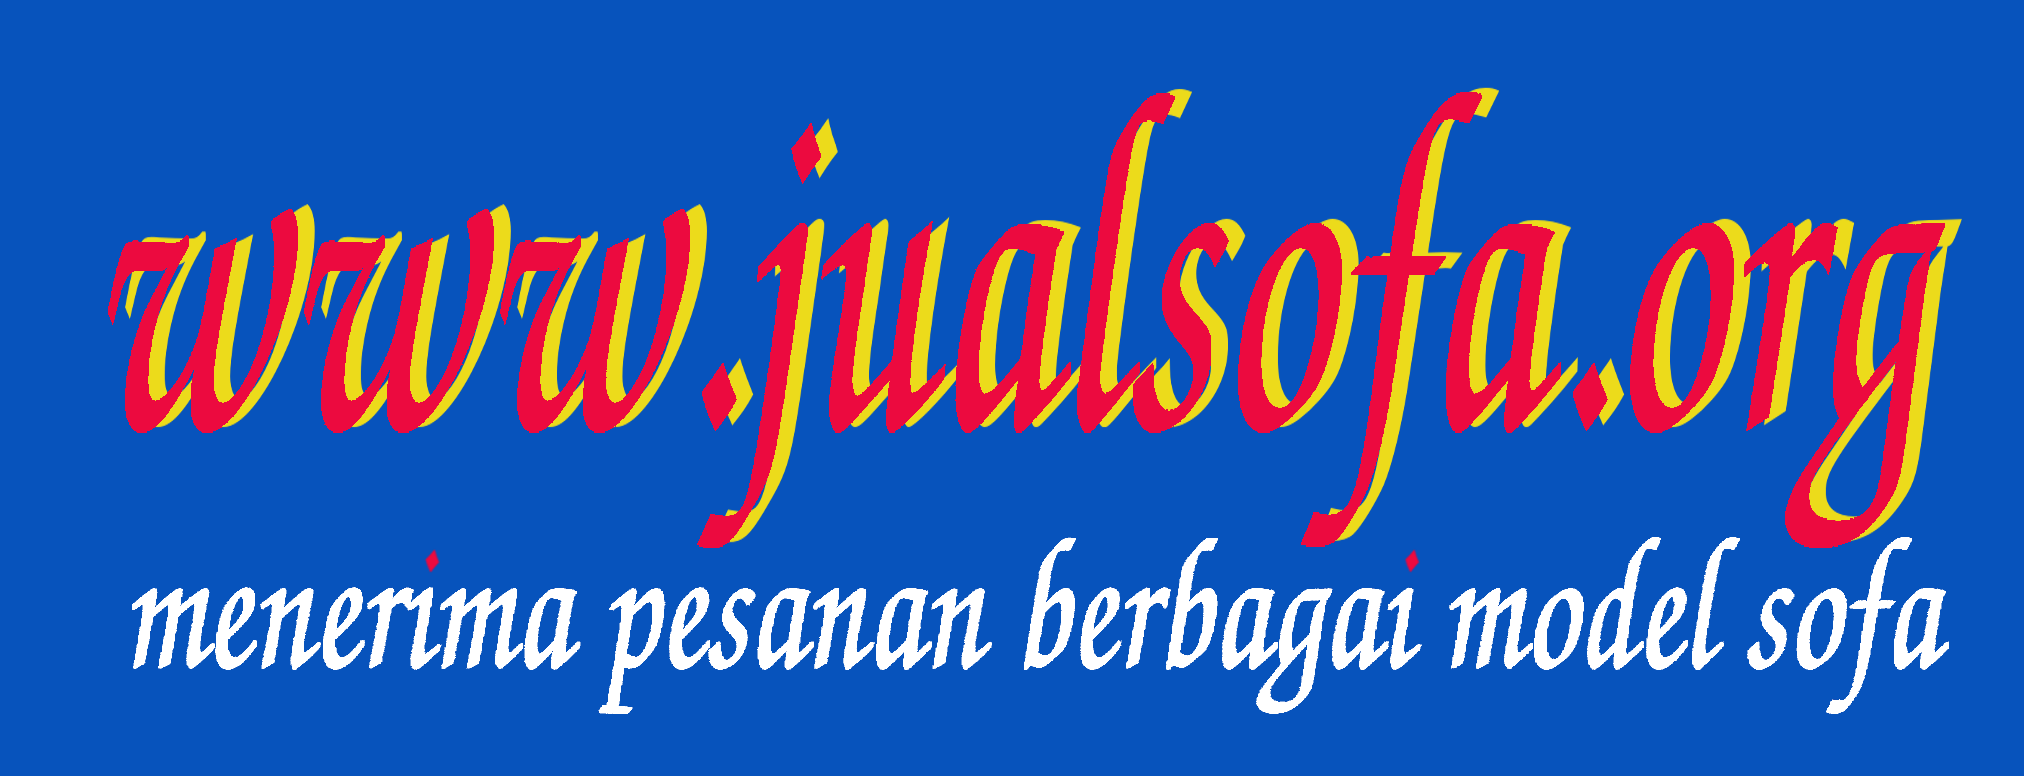 Server Java Reload Harga Pulsa Game Online Lyto 20000 Koin Sponsor